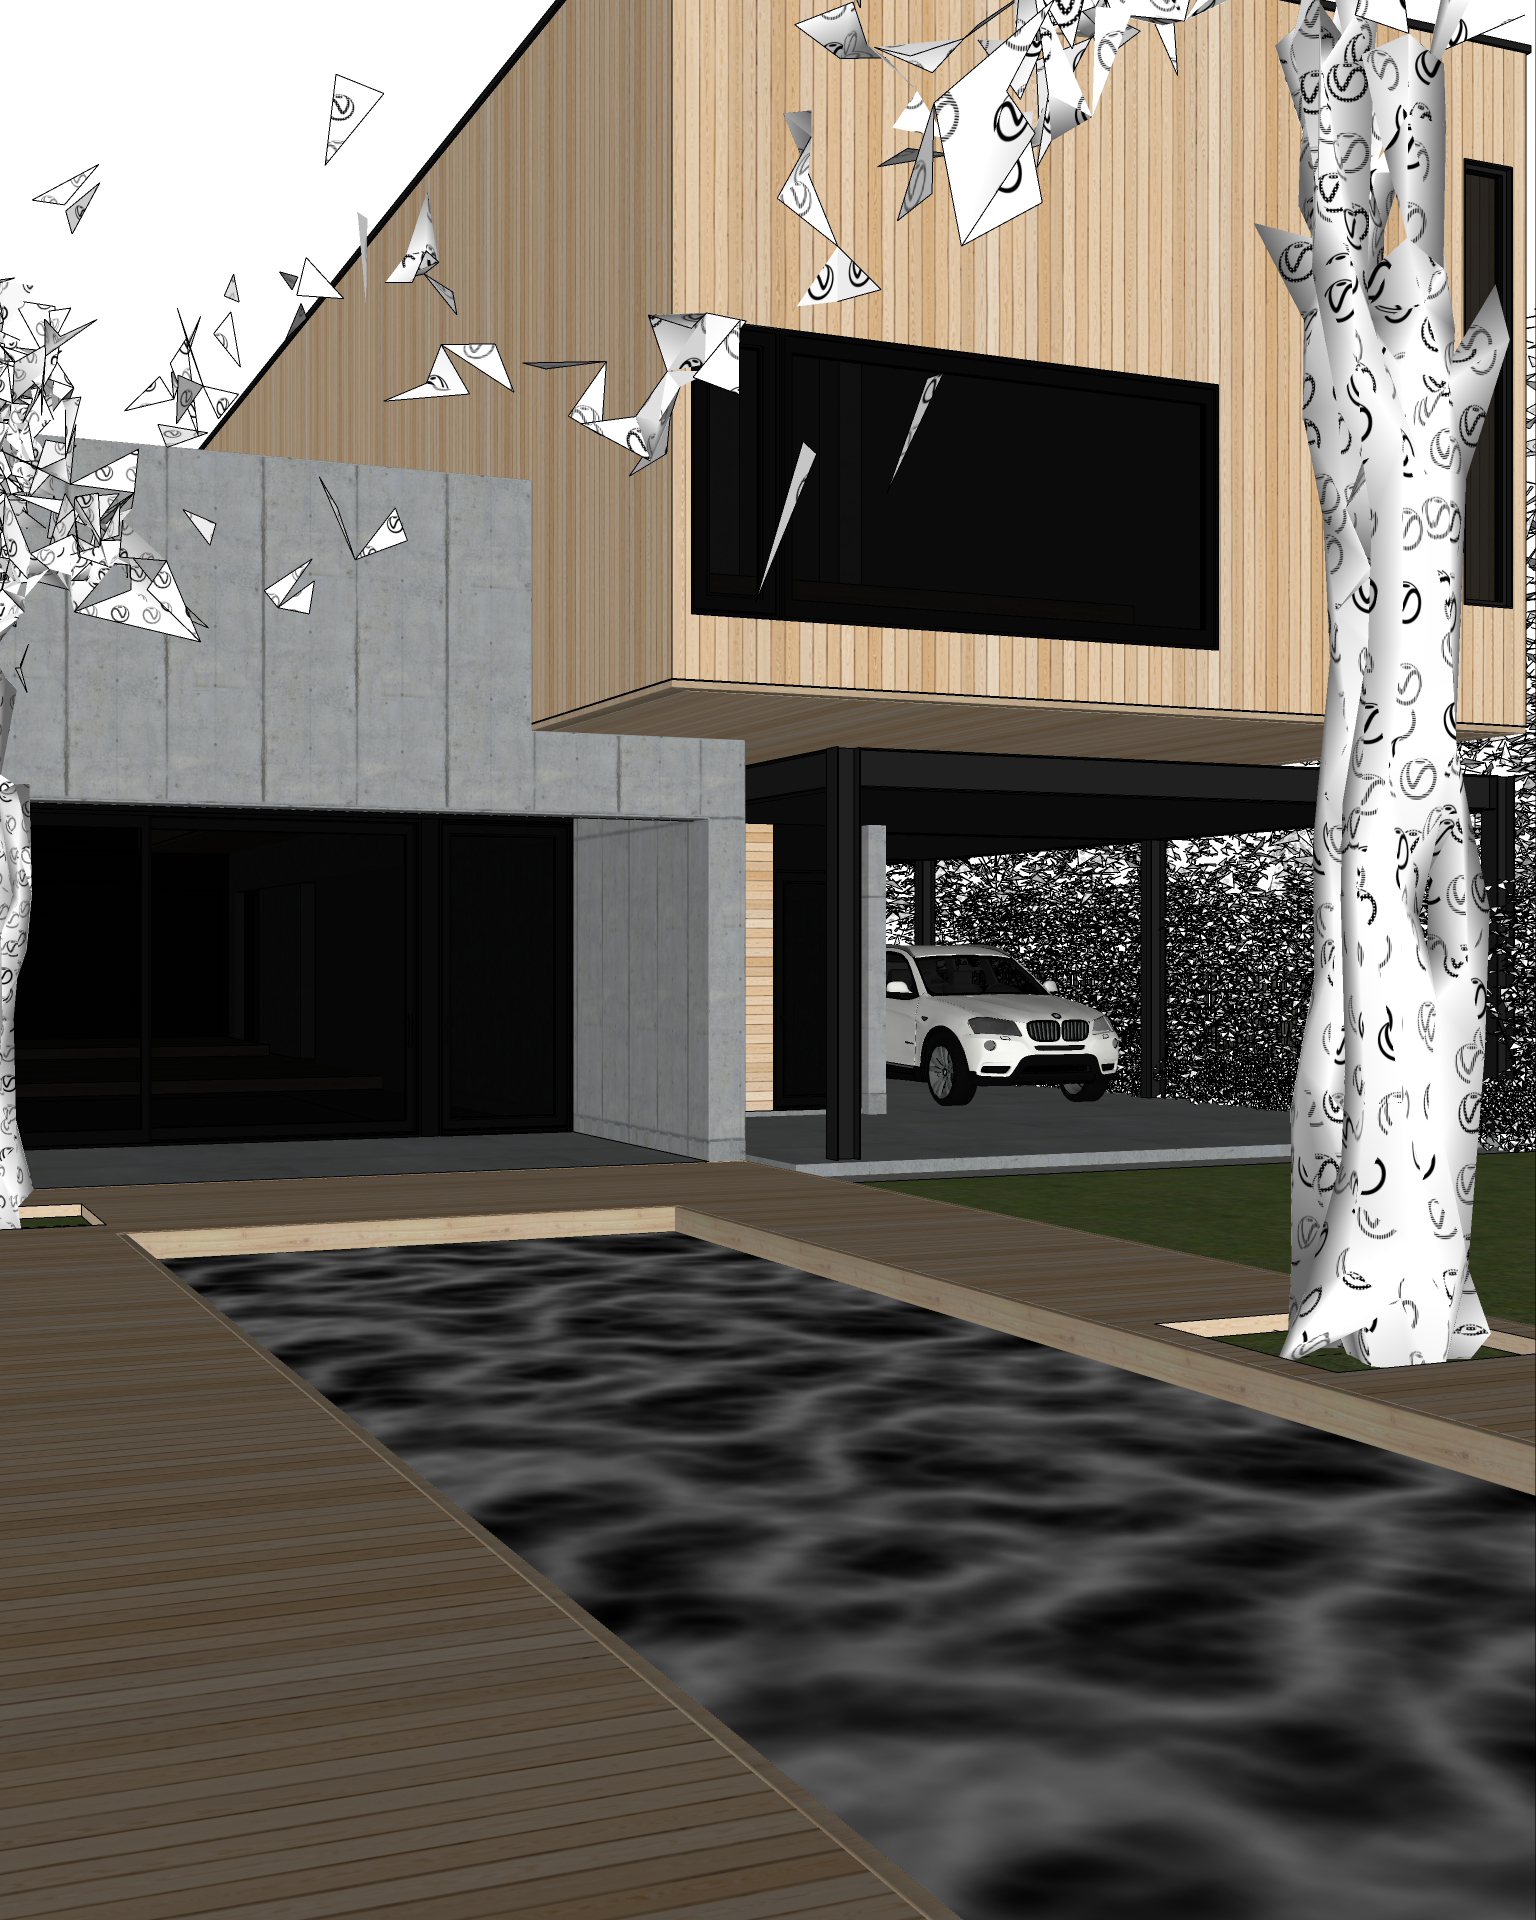 Concrete Box House View 2 Screenshot.jpg